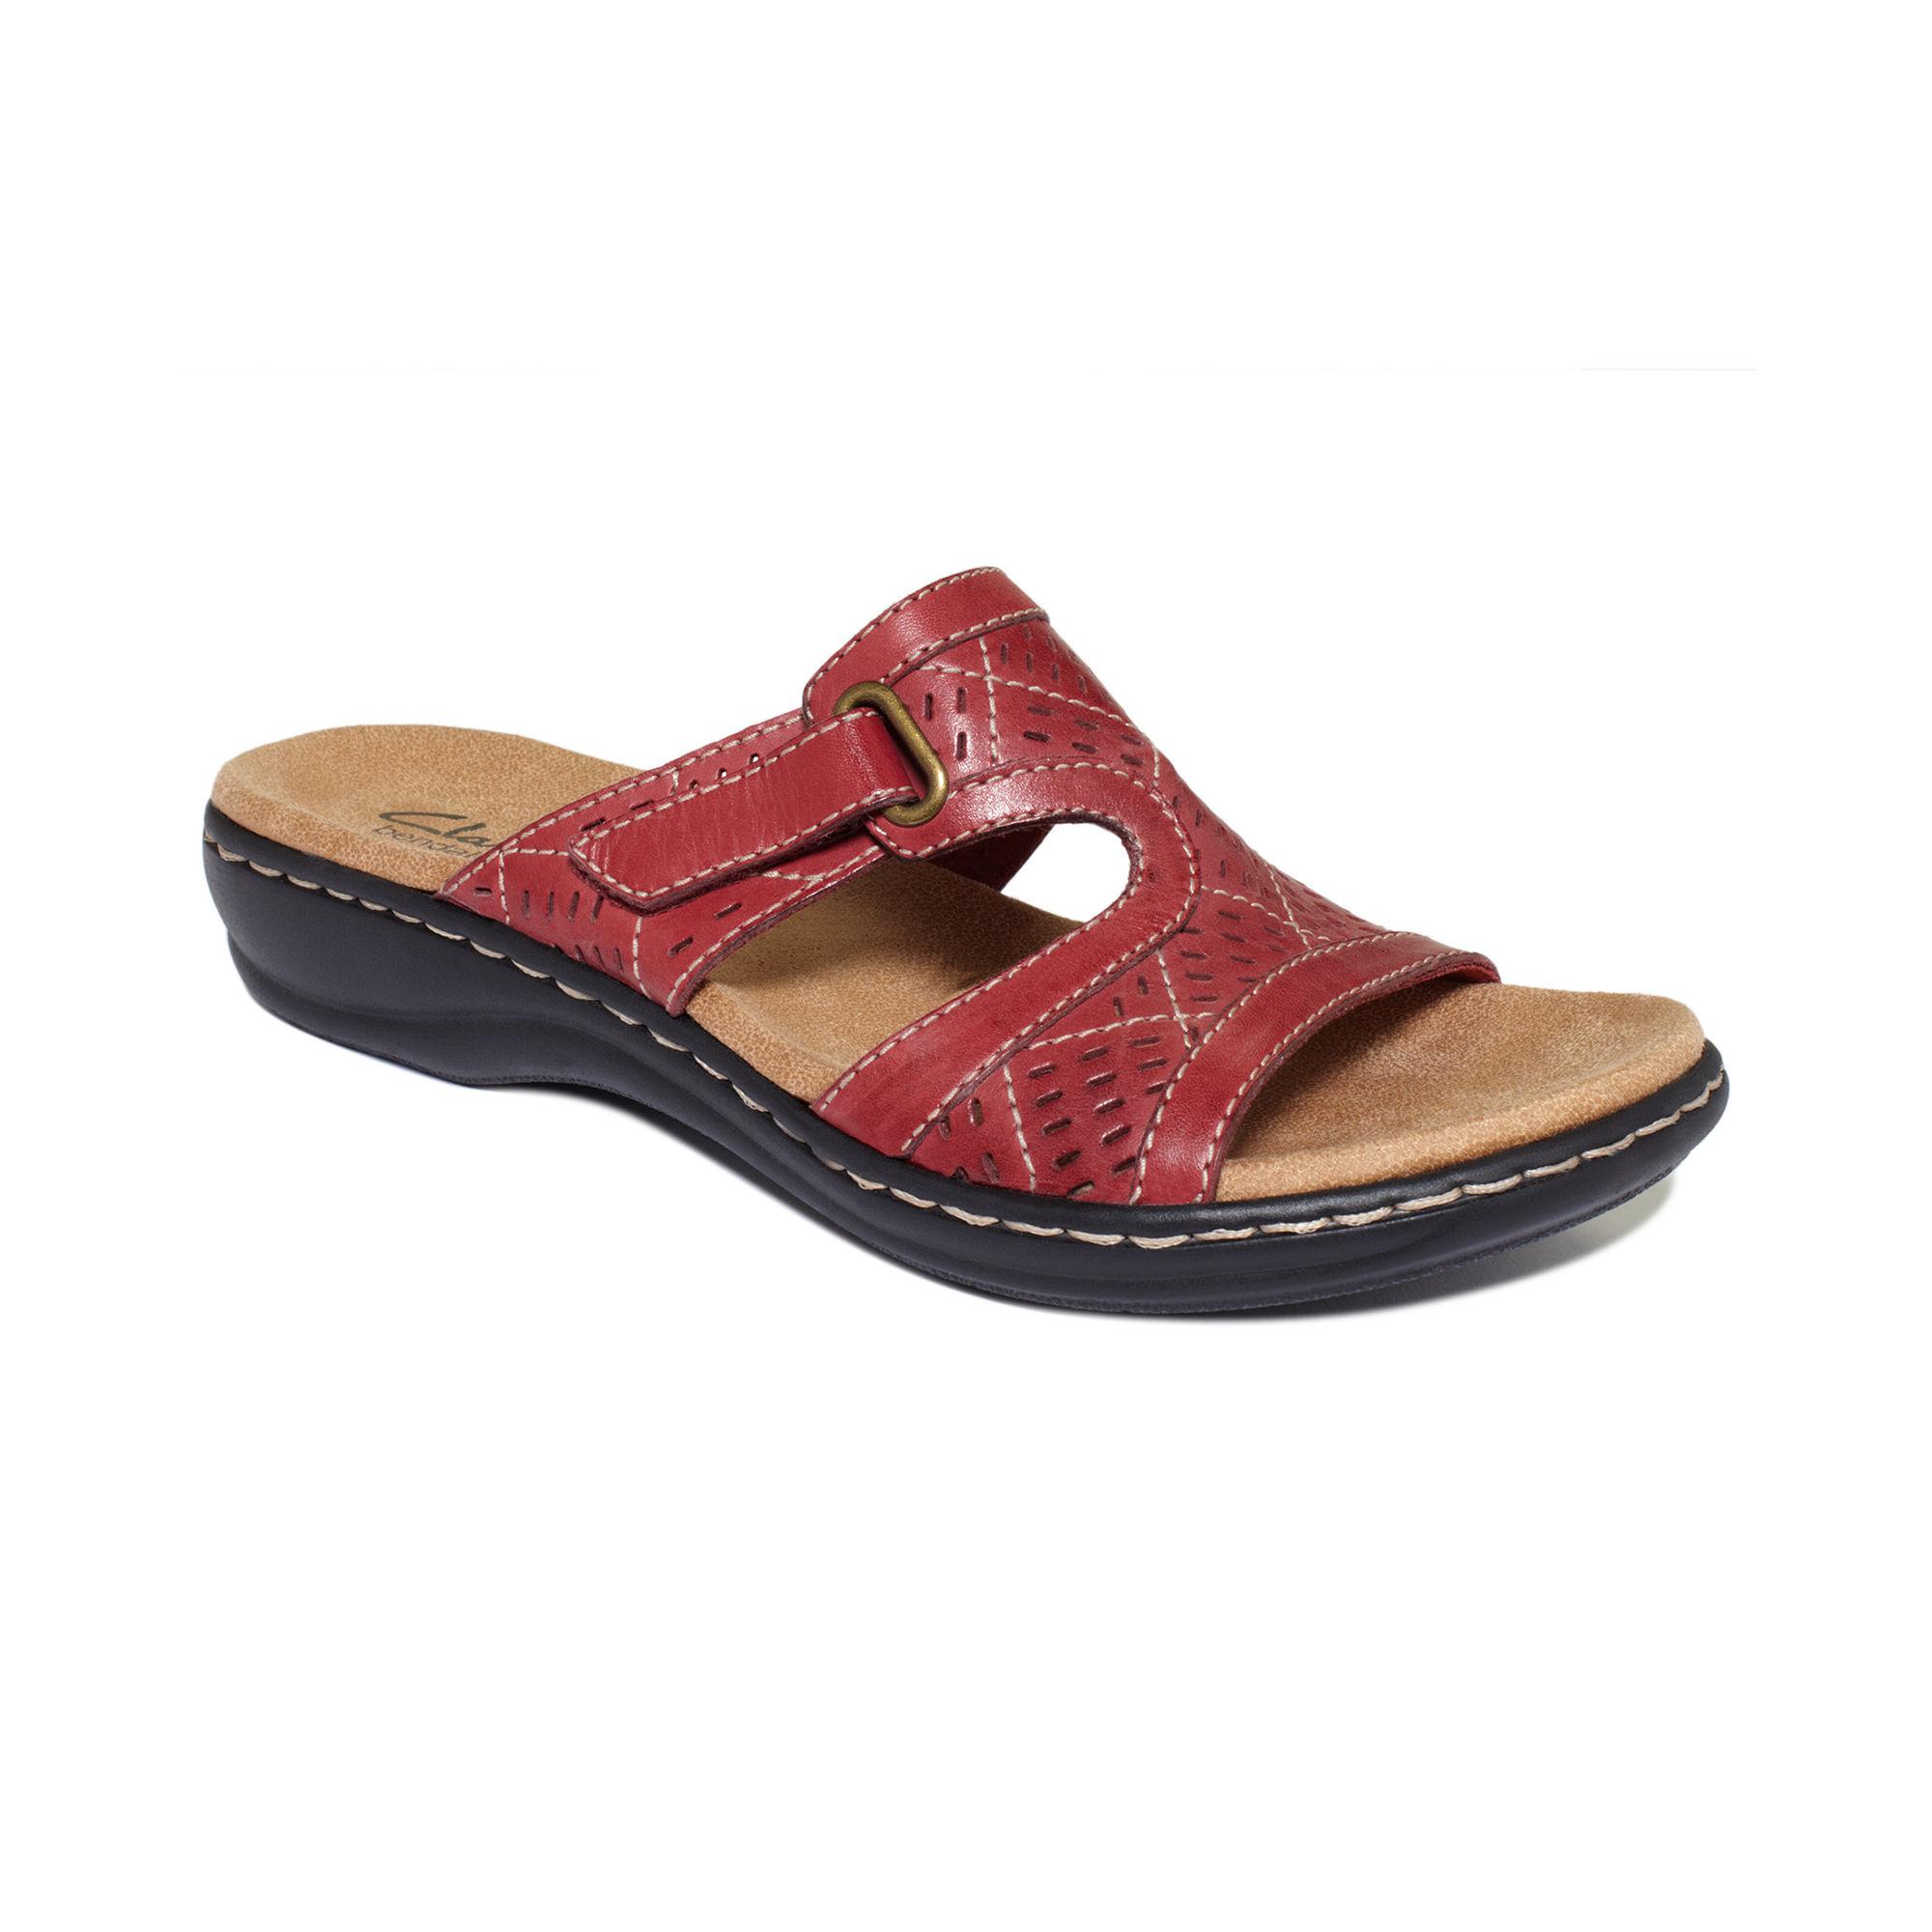 1c5cd5a8f4919c Clarks Ladies  Un Swish  Black Patent Casual Sandals